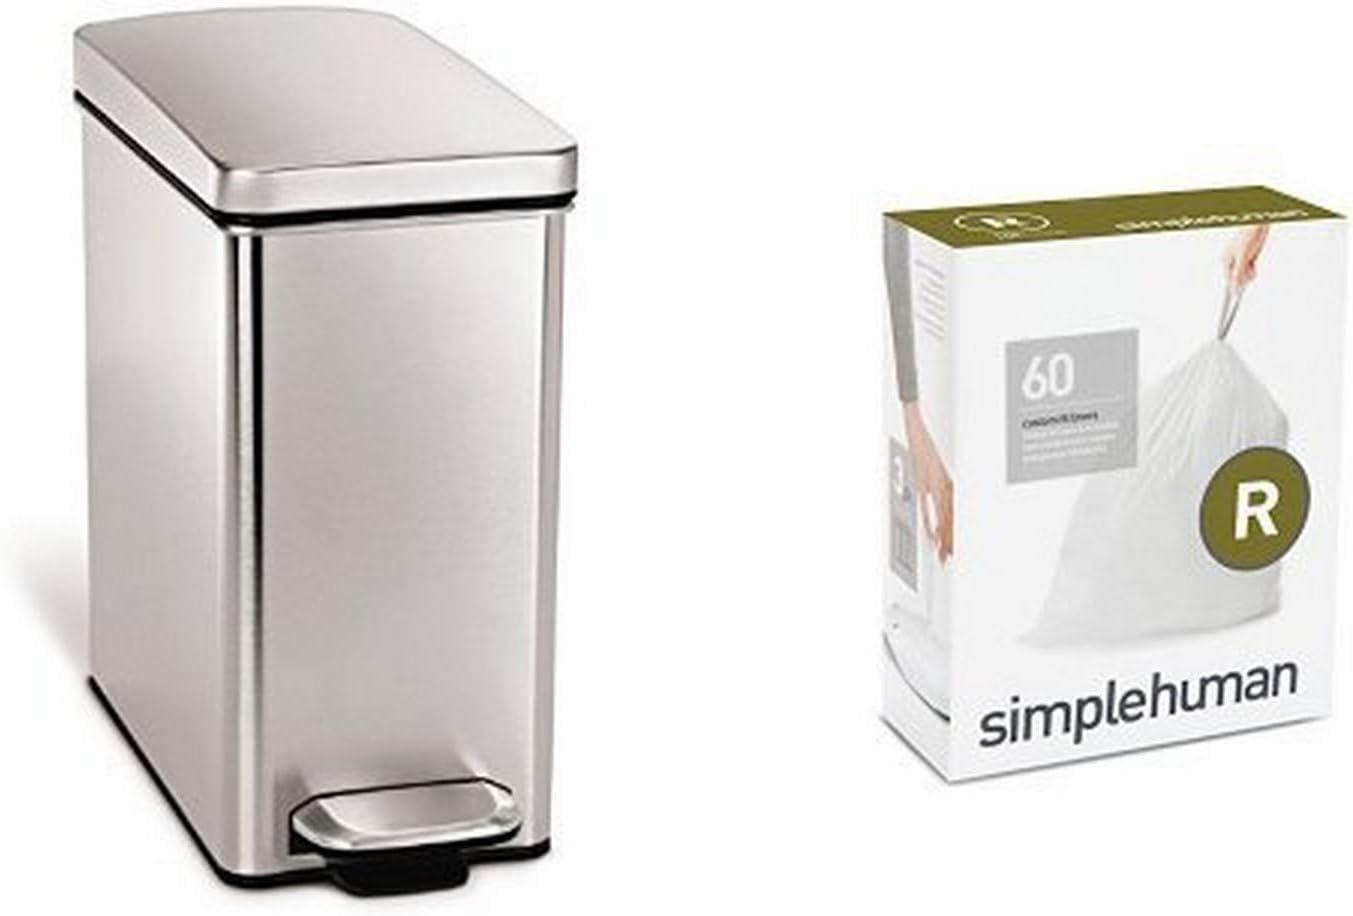 simplehuman 10 Under blast sales litre Ranking TOP10 profile fingerprint-proof brushed can step